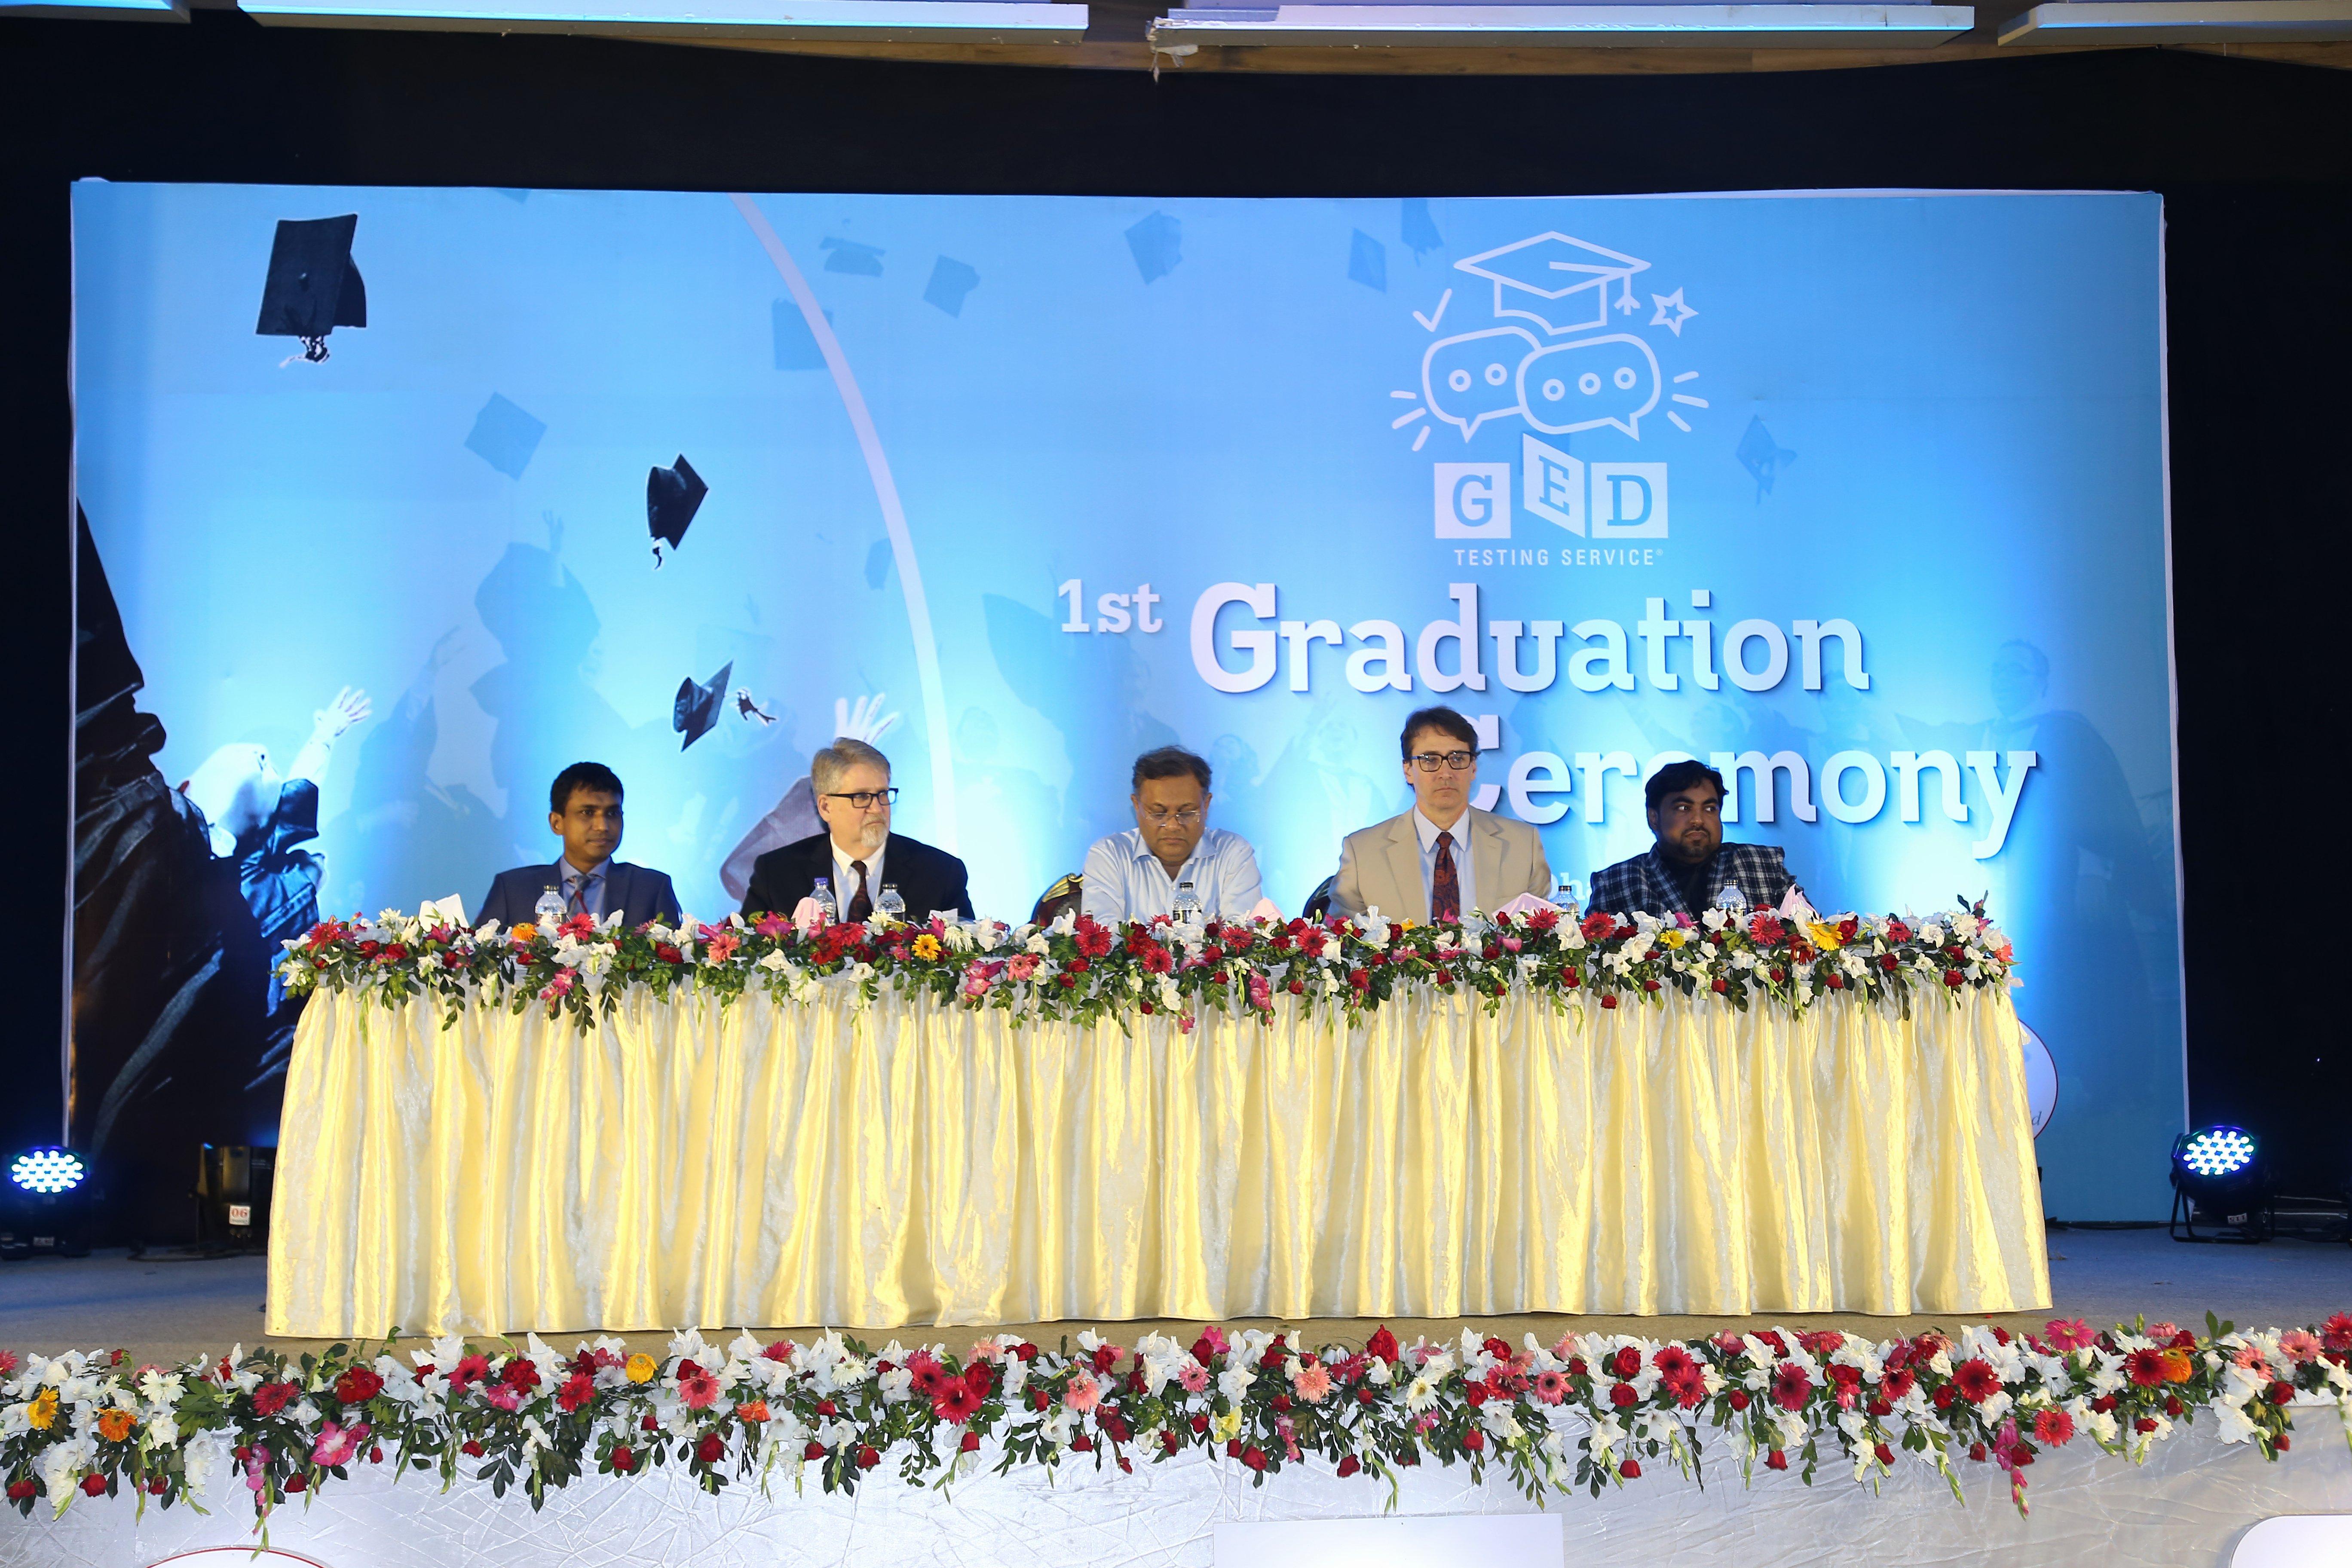 Ged Graduation Speech Examples Best Of Ged Graduation Ceremony In Dhaka – Pi International